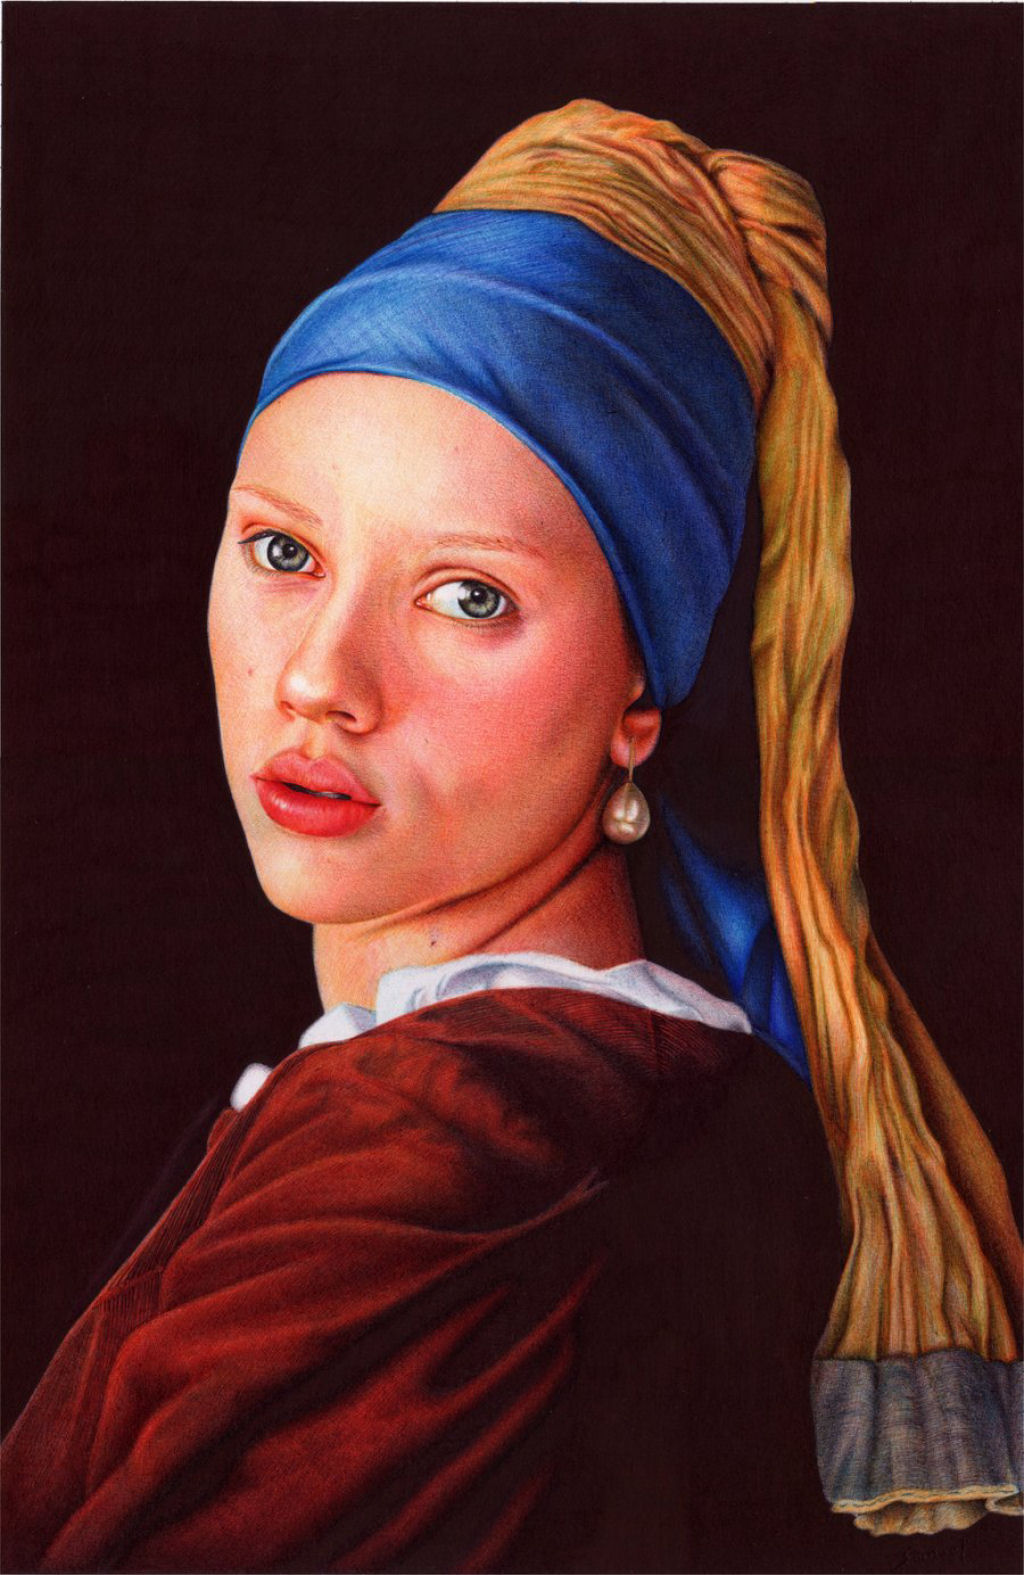 Outras incríveis pinturas feitas com caneta Bic de Samuel Silva 06